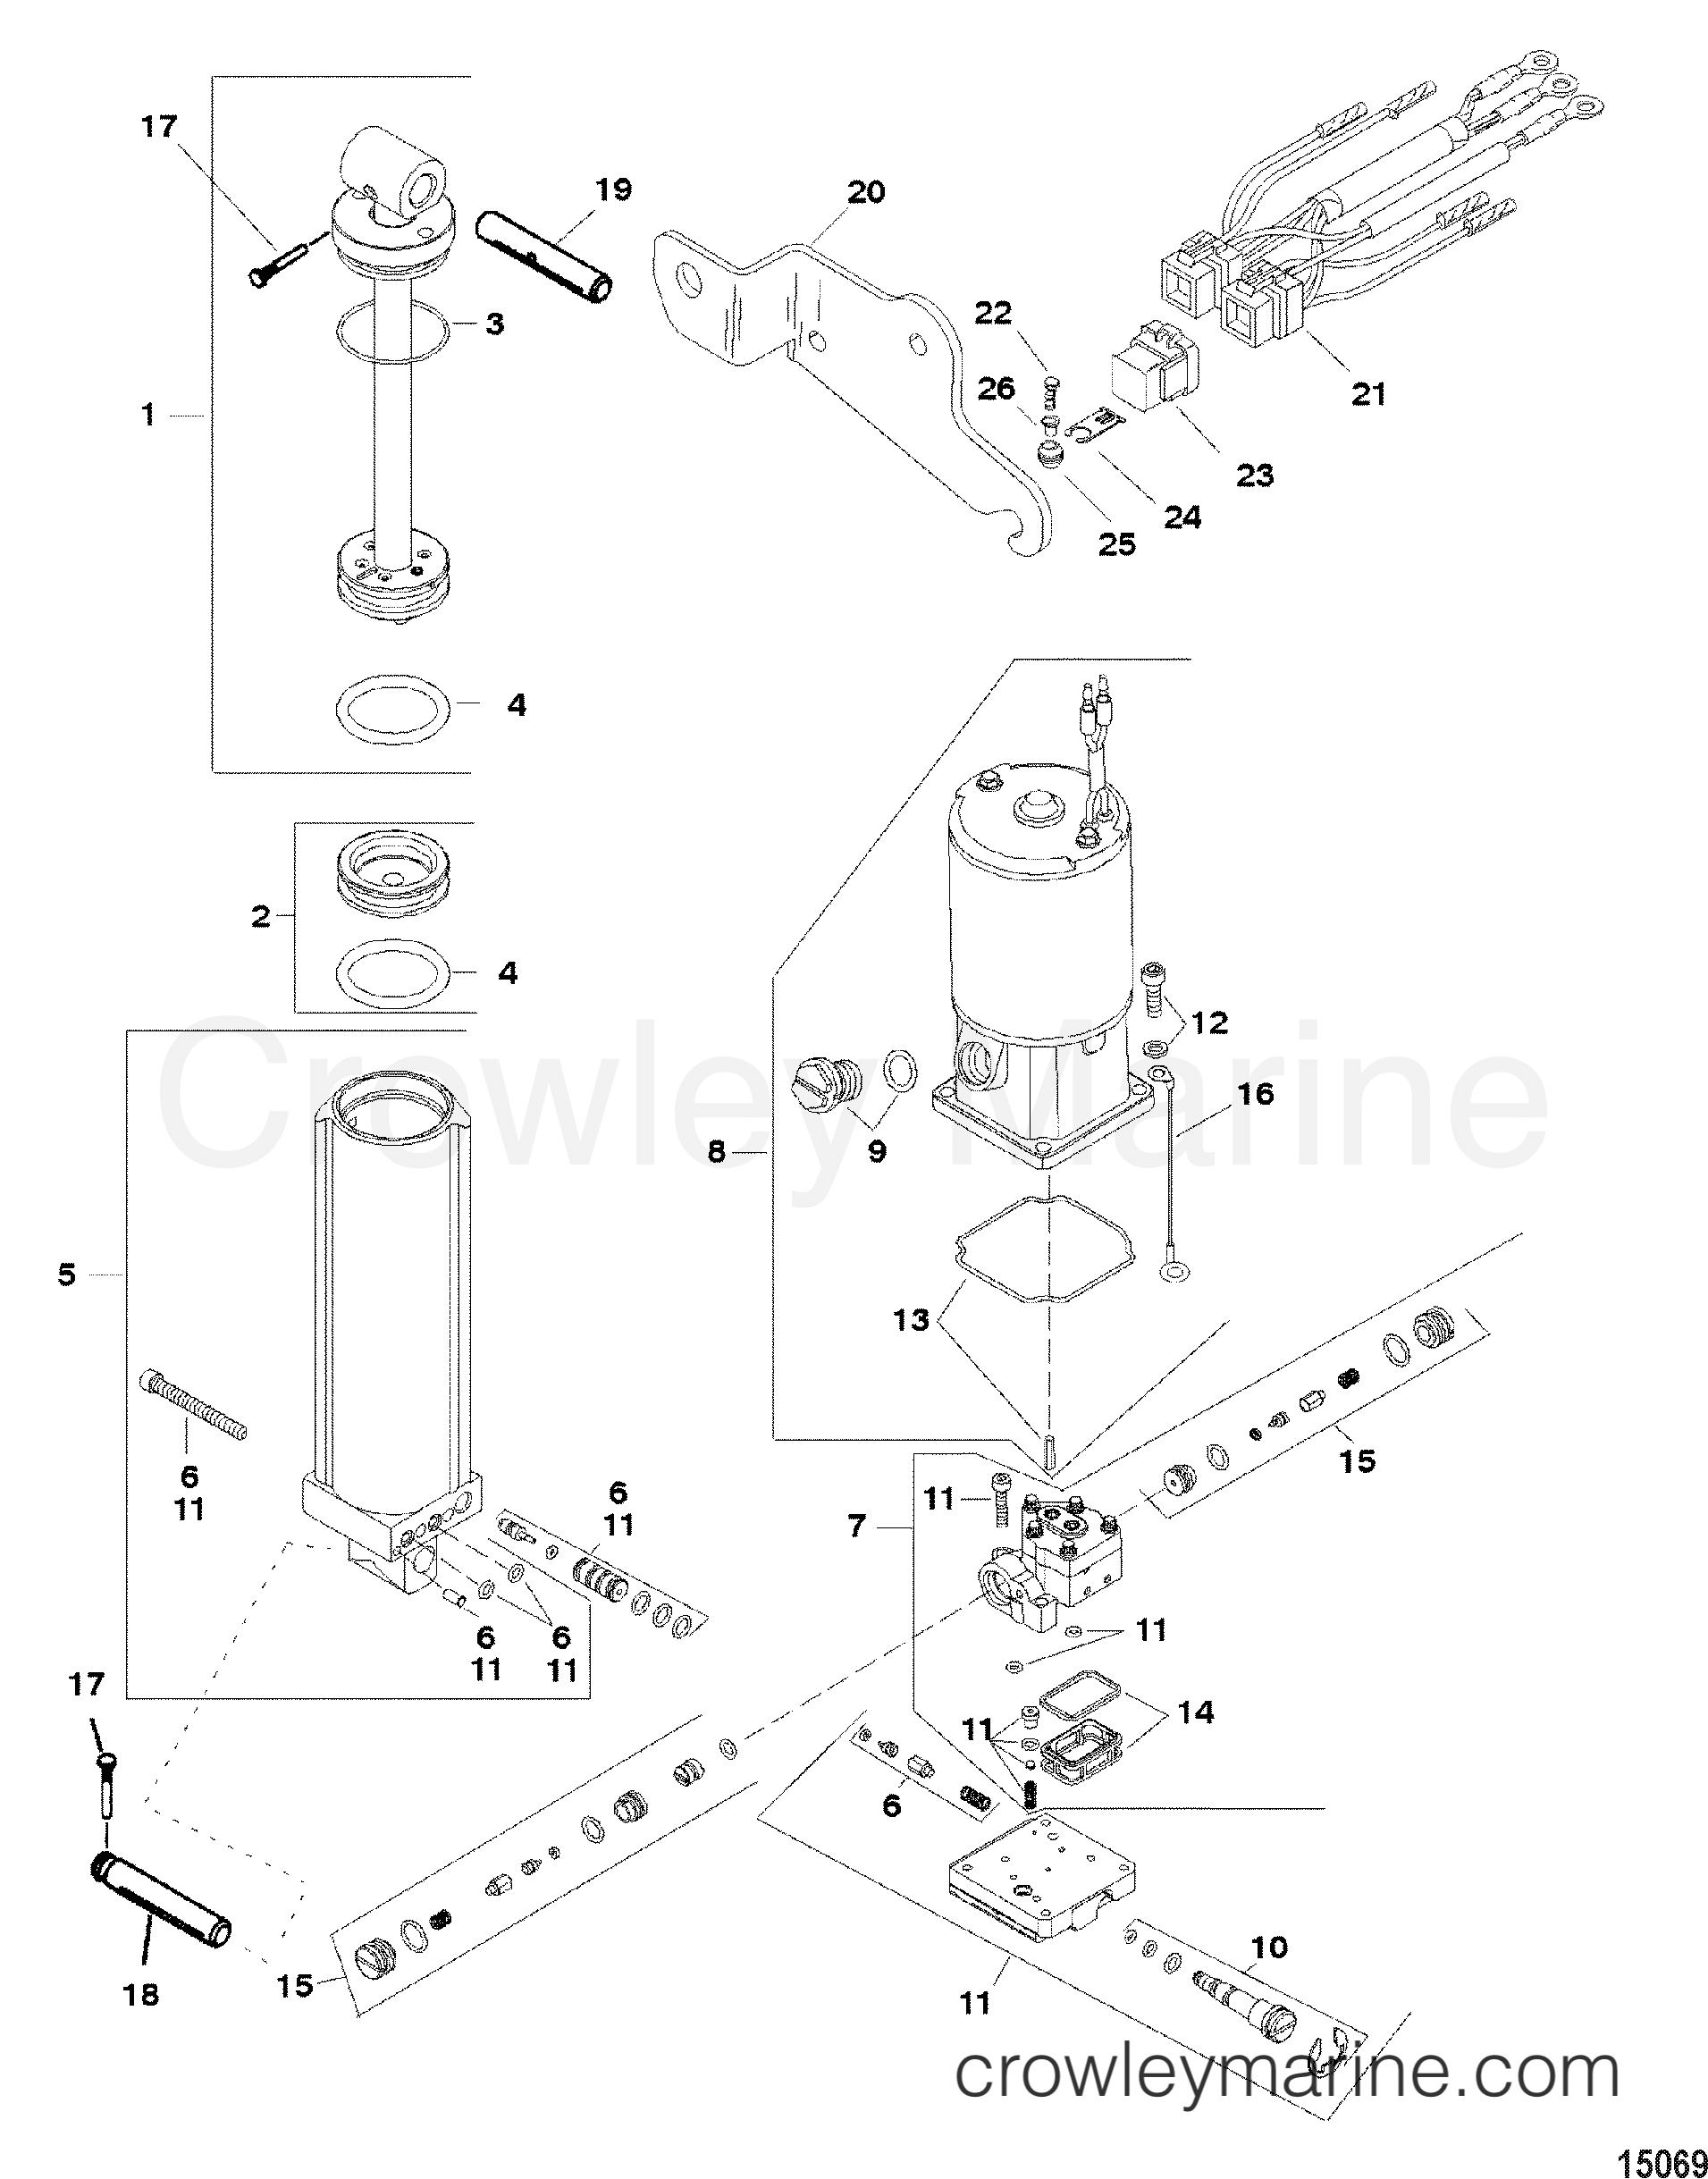 power trim pump assembly 830150a2